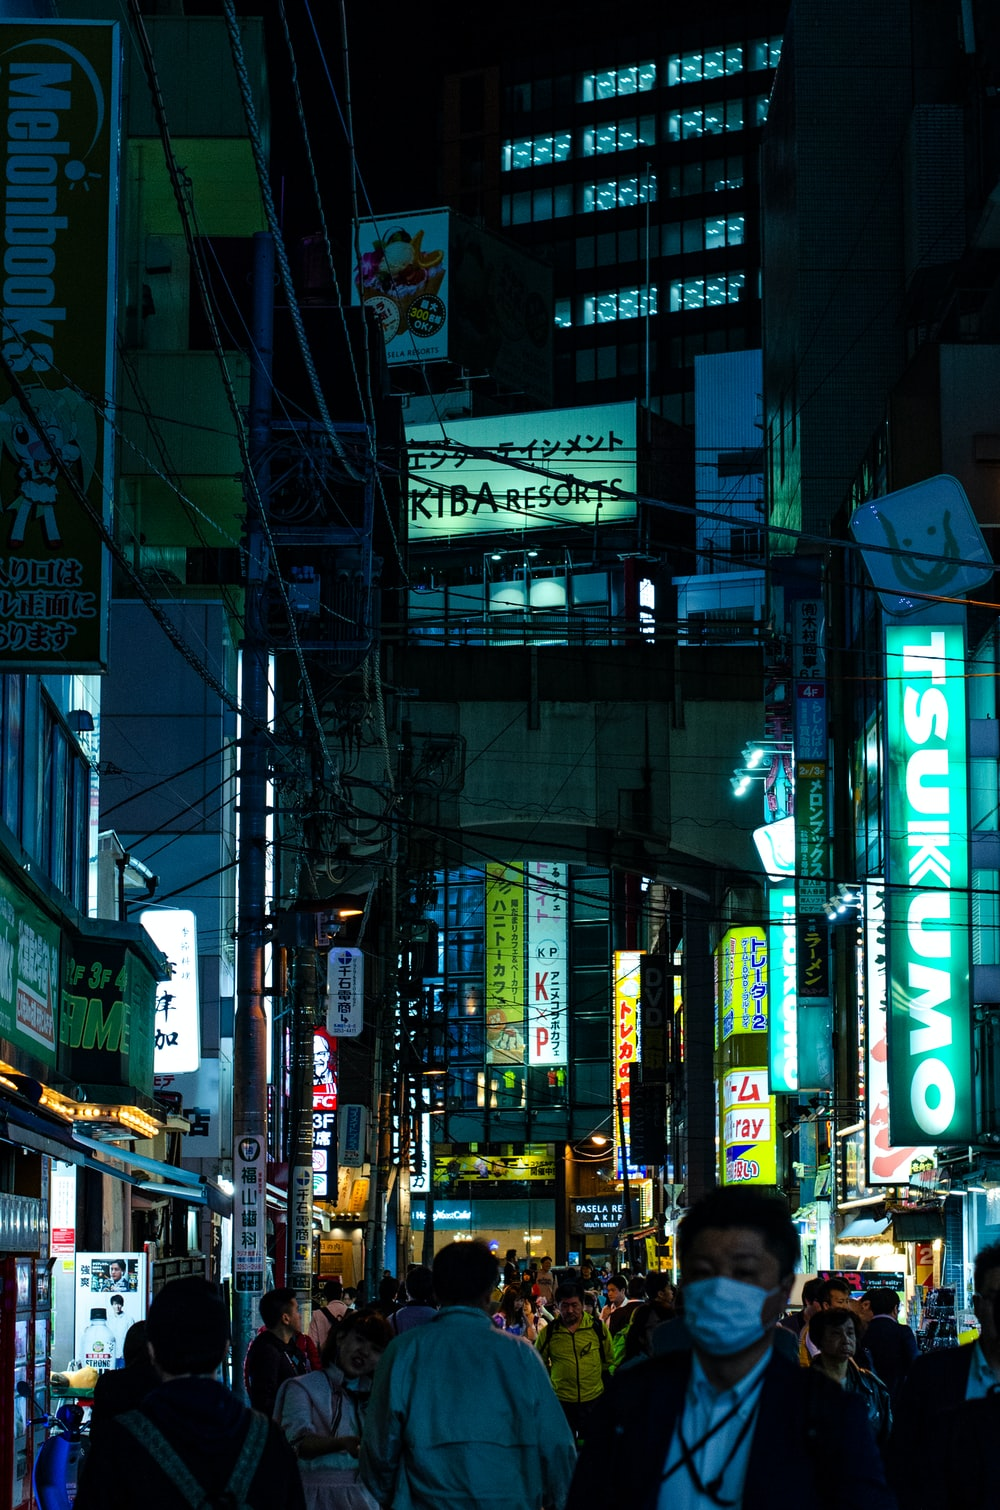 people gathering near street between building during nighttime